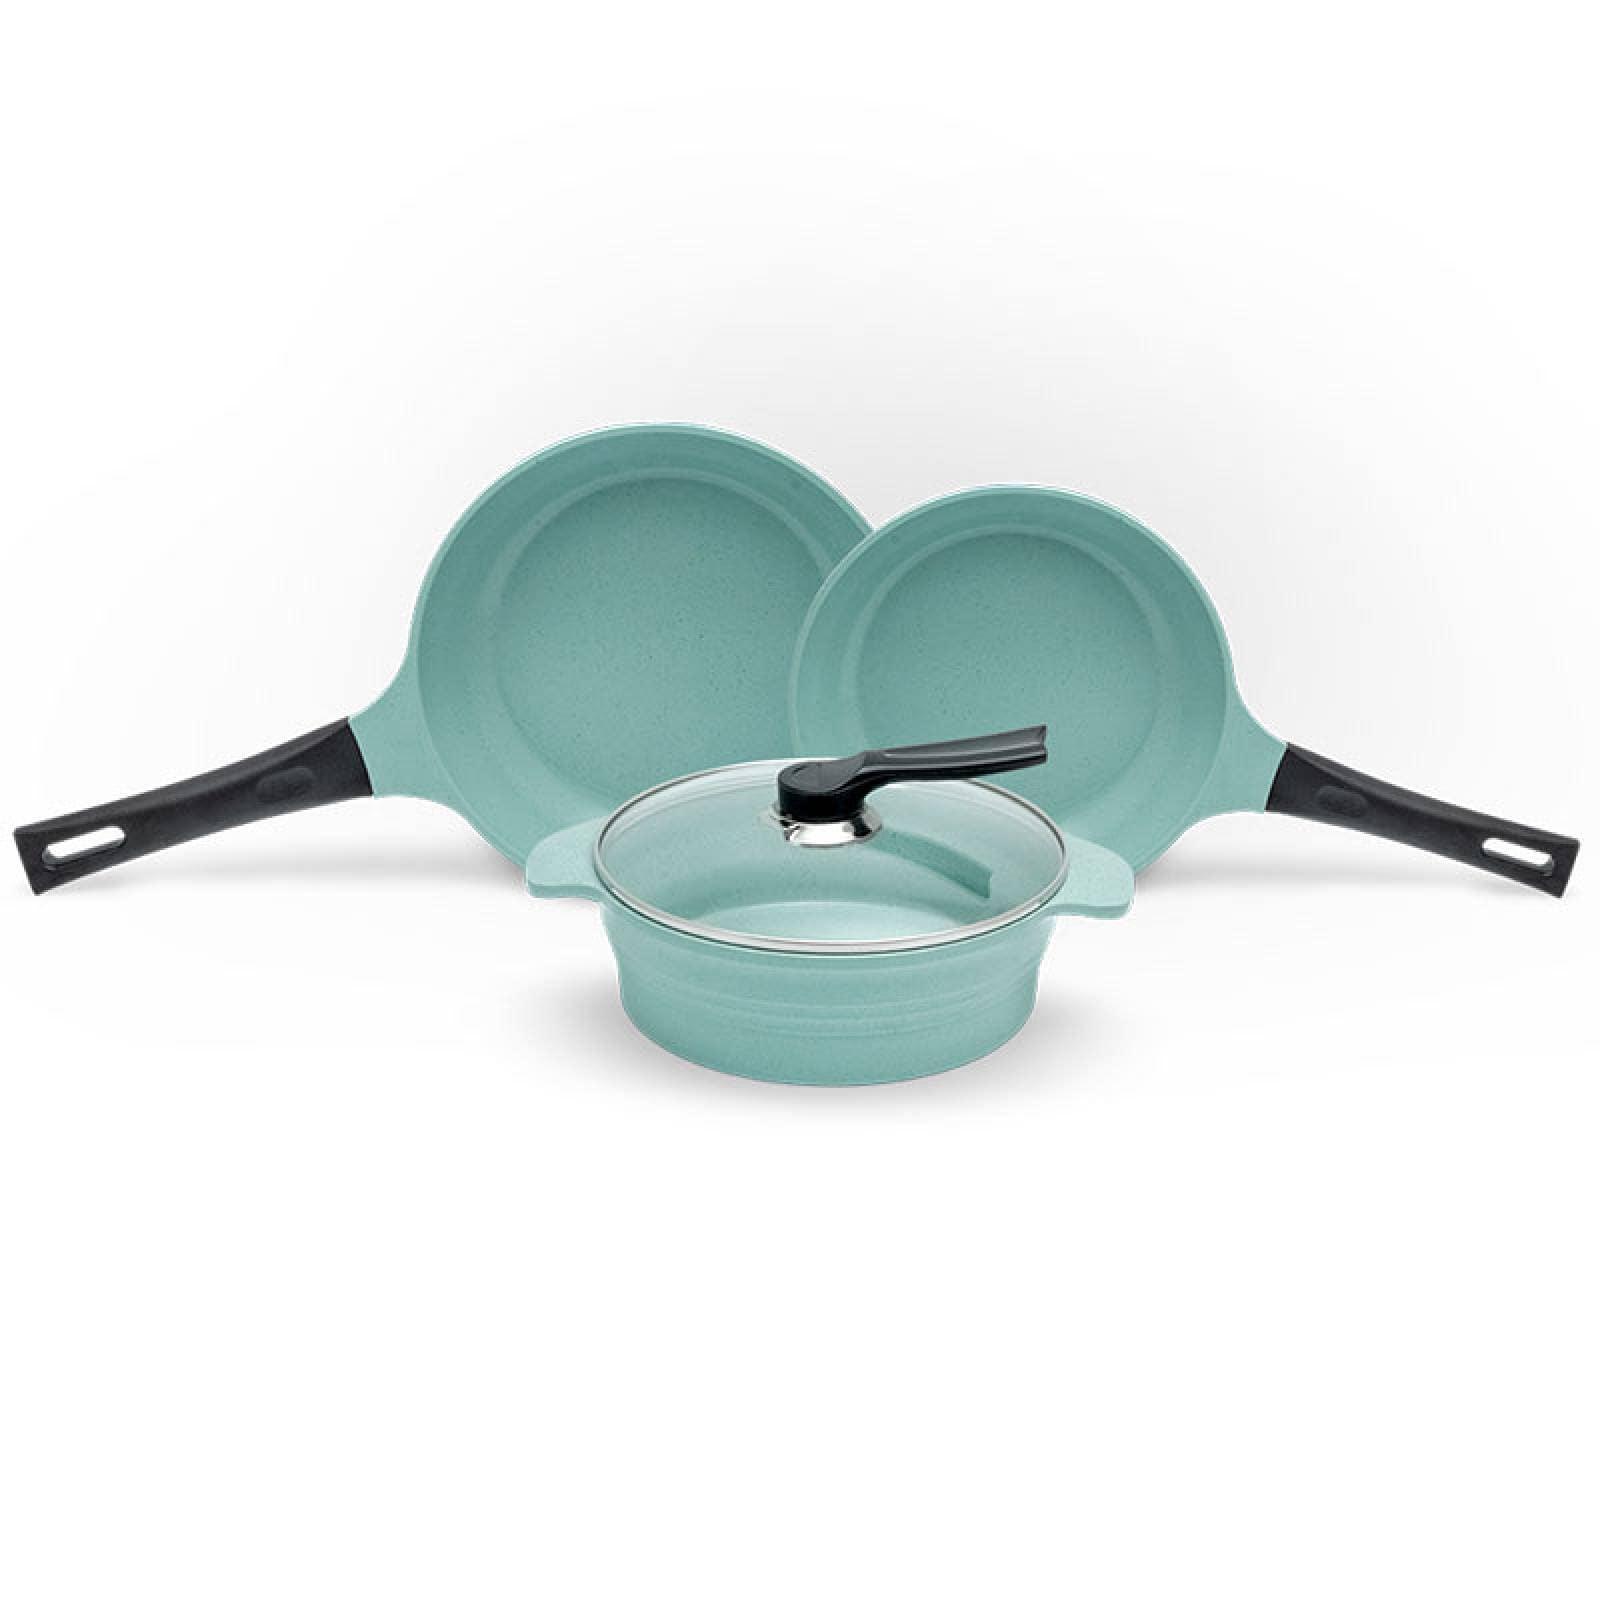 Bateria De Cocina Jade Cook Cv Directo Cocina Sin Grasa No Se Pega